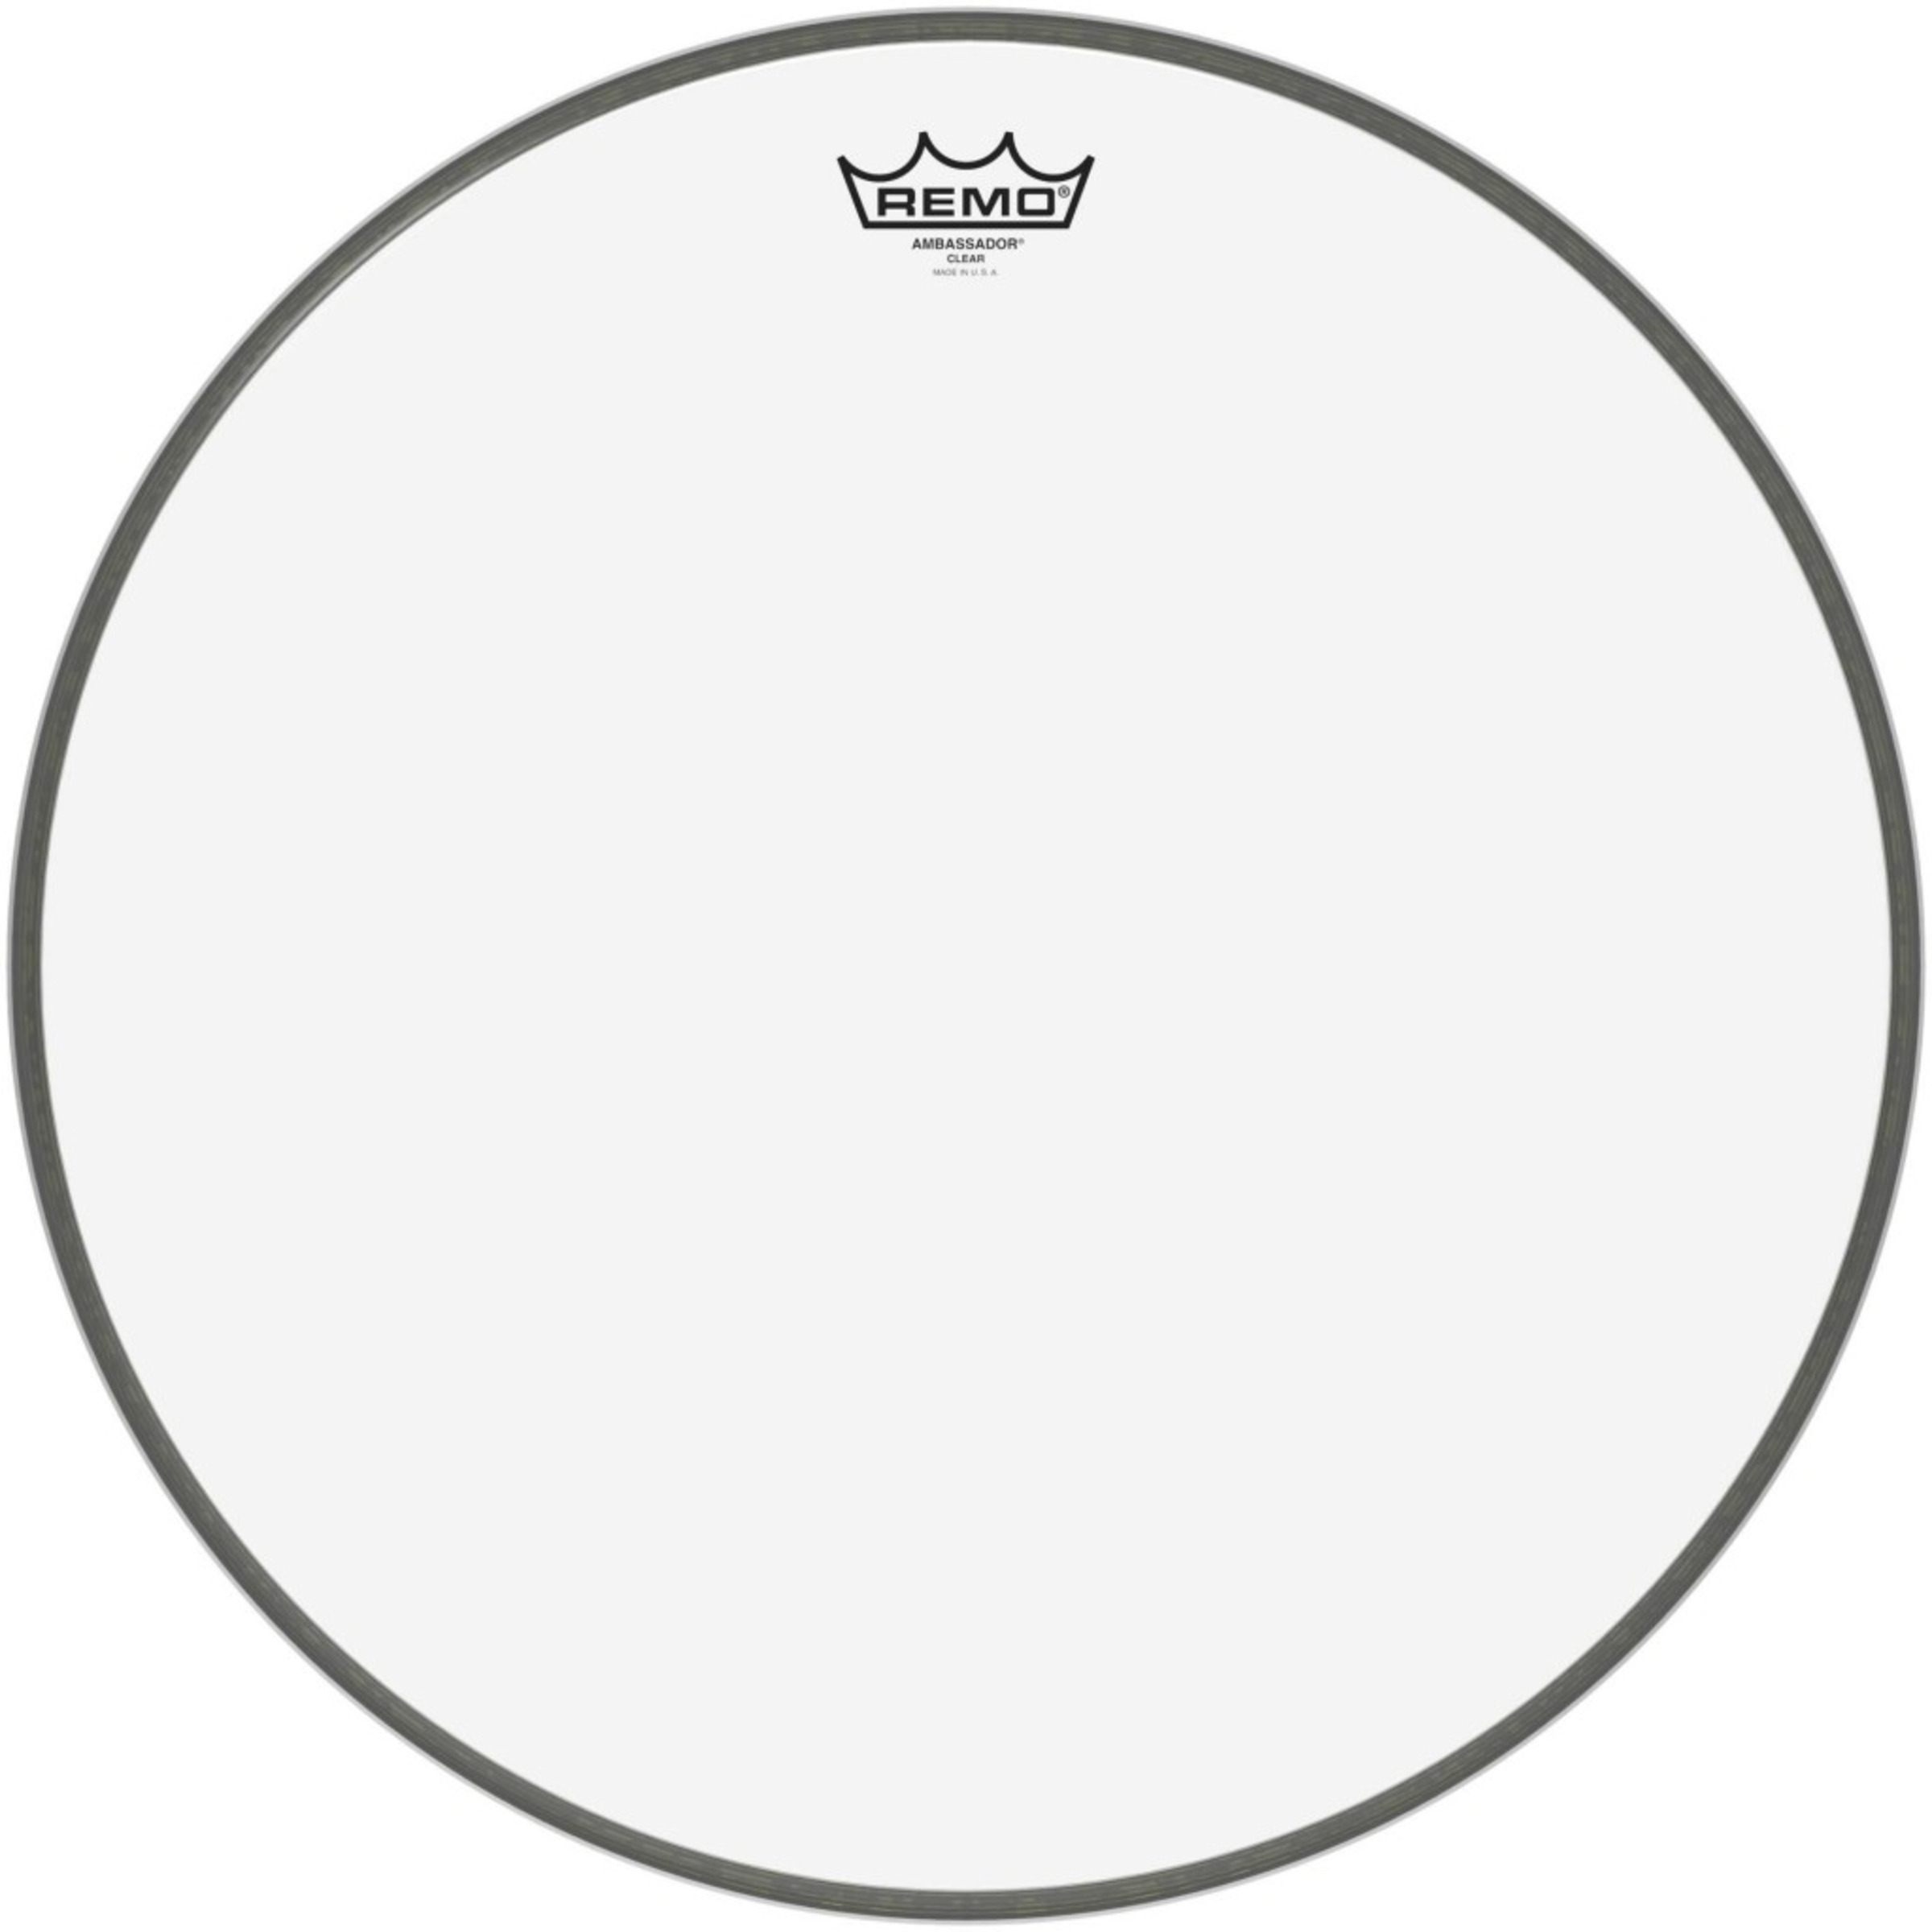 remo ambassador clear bass drum head giggear. Black Bedroom Furniture Sets. Home Design Ideas